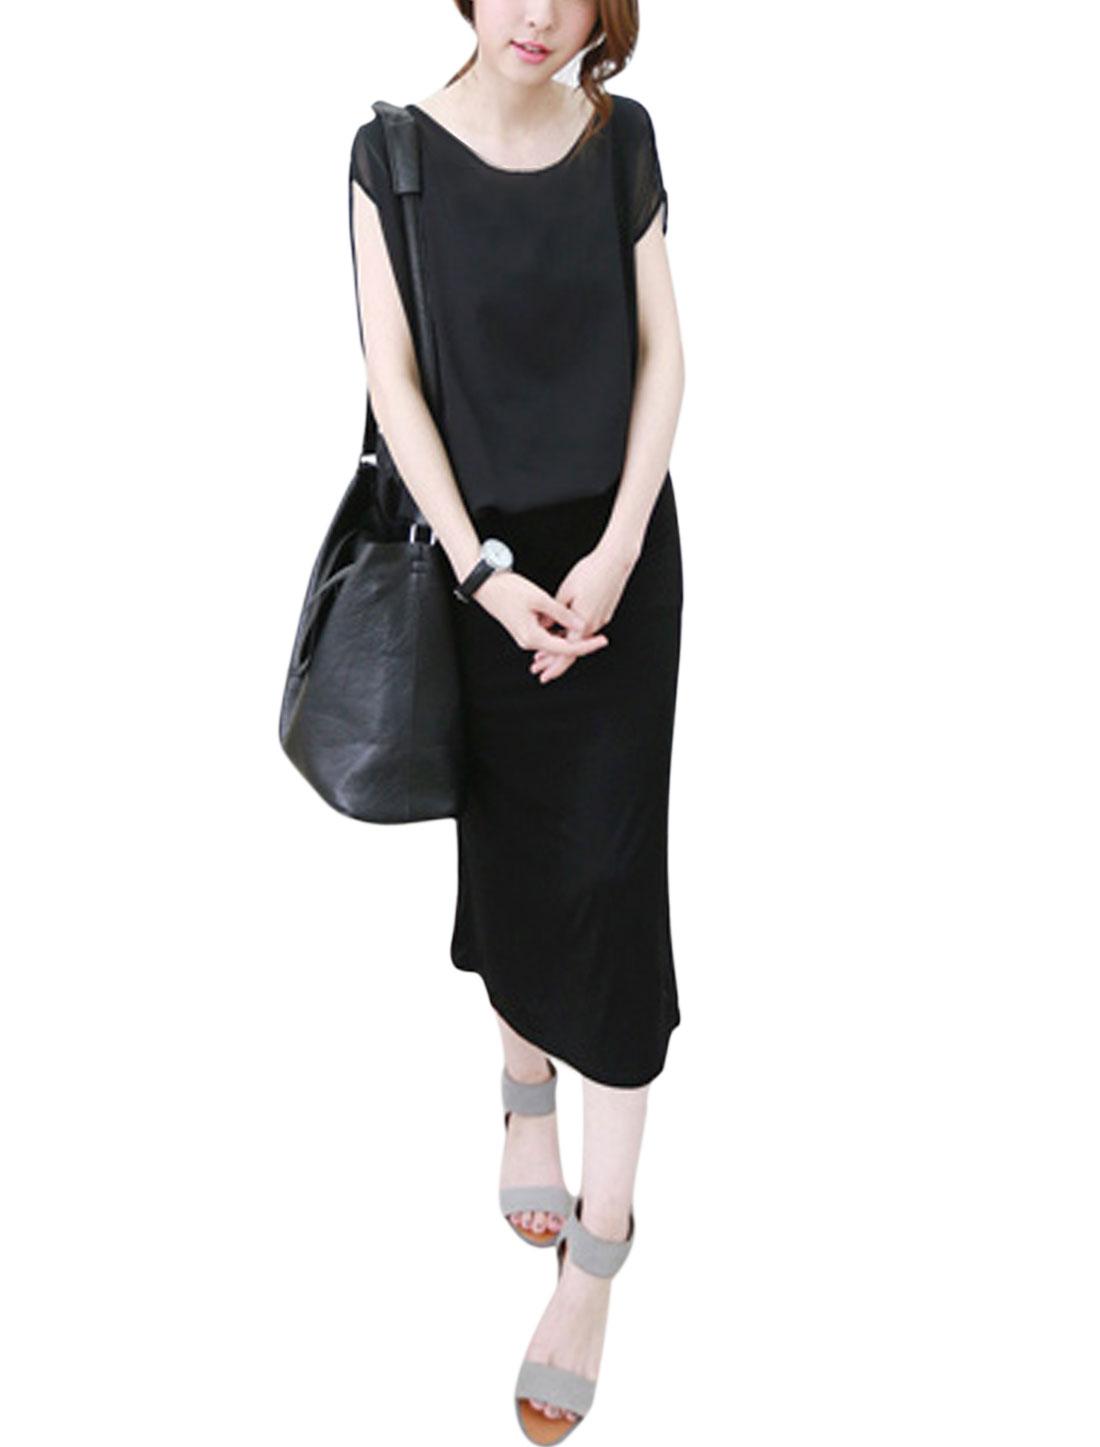 Women Short Dolman Sleeves Chiffon Panel Layered Midi Dress Black XS